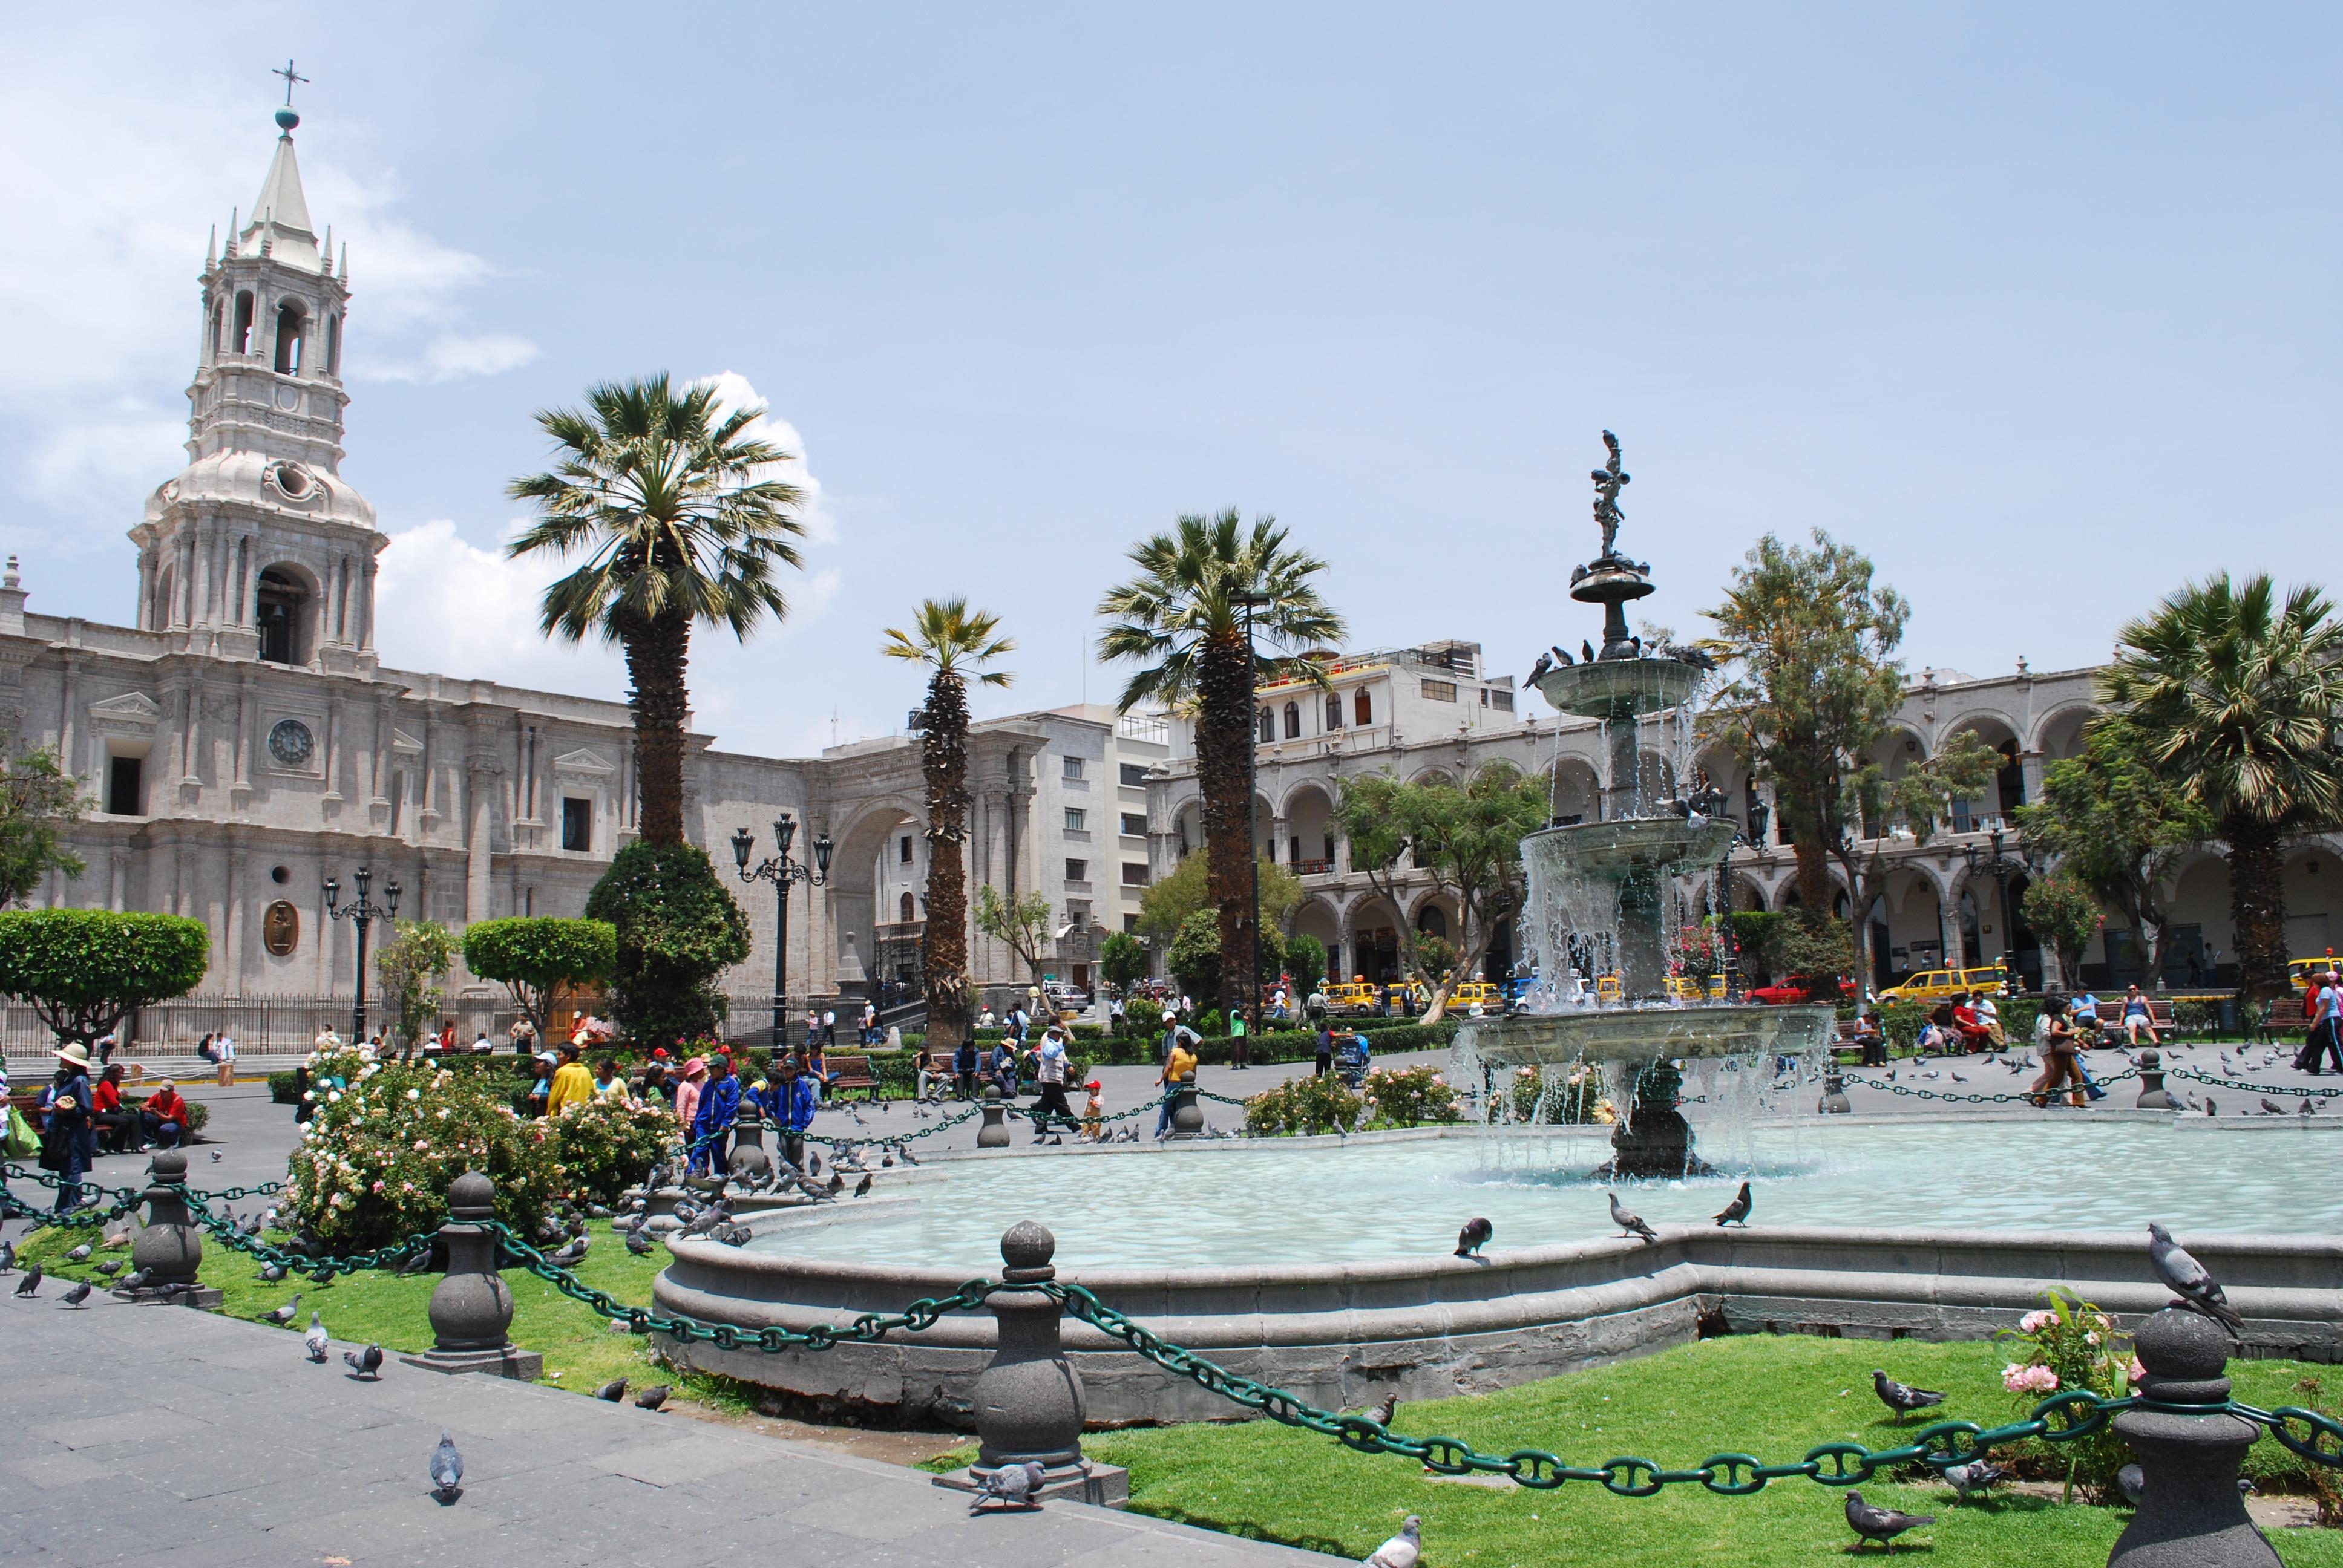 File:Plaza de Arequipa.jpg - Wikimedia Commons